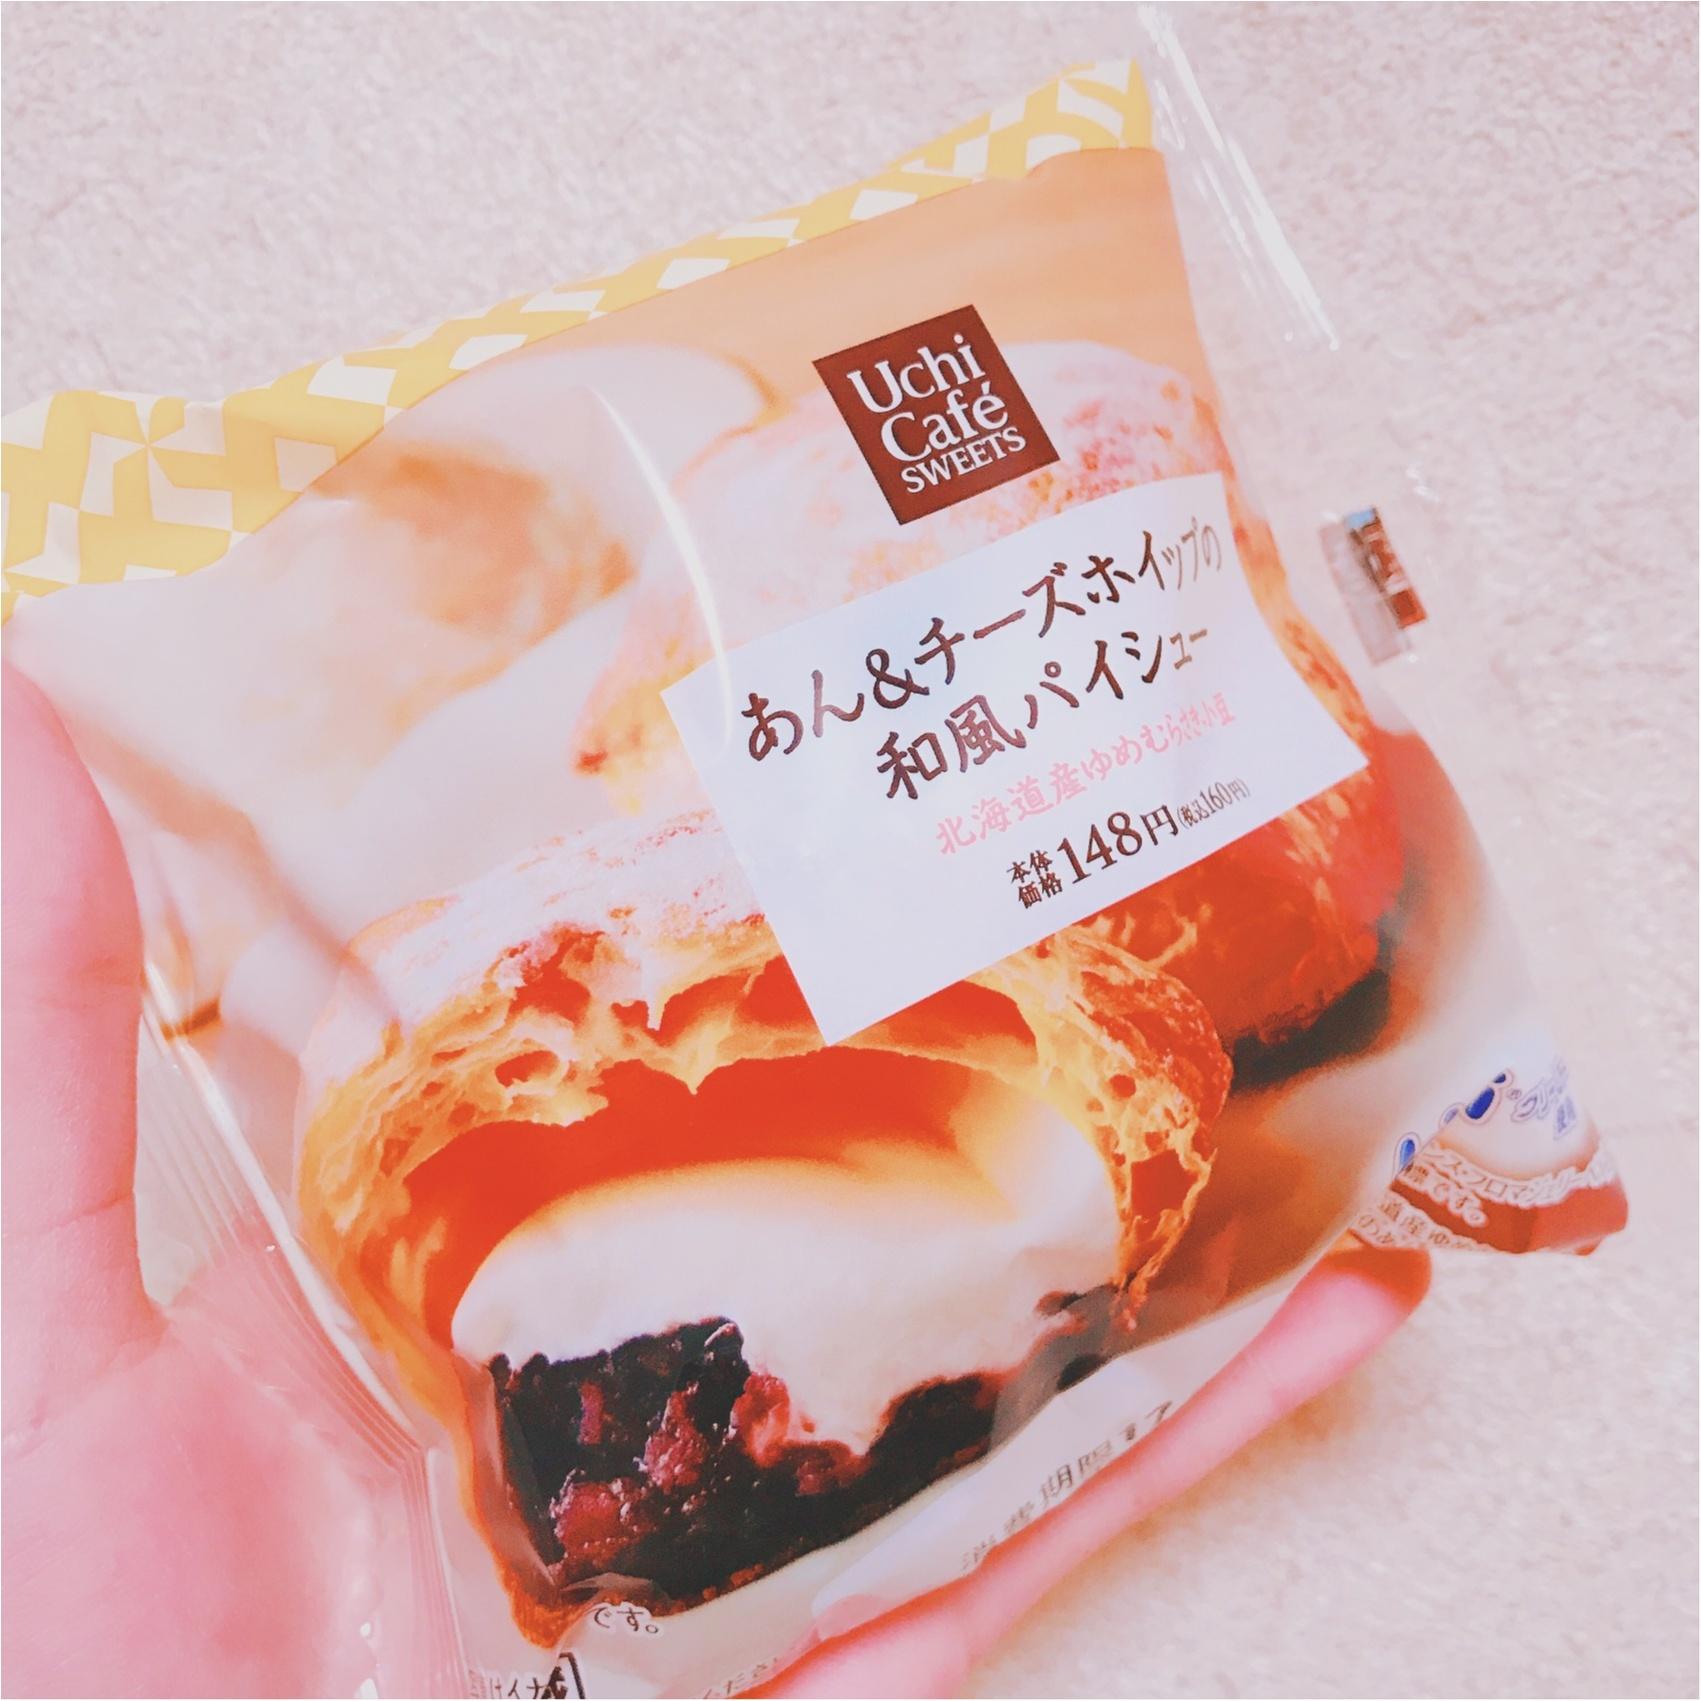 kiri®︎ チーズと北海道産ゆめむらさき小豆がコラボ⁉︎《Uchi Café SWEETS》のニューフェイスが激うまっ♡っ_1